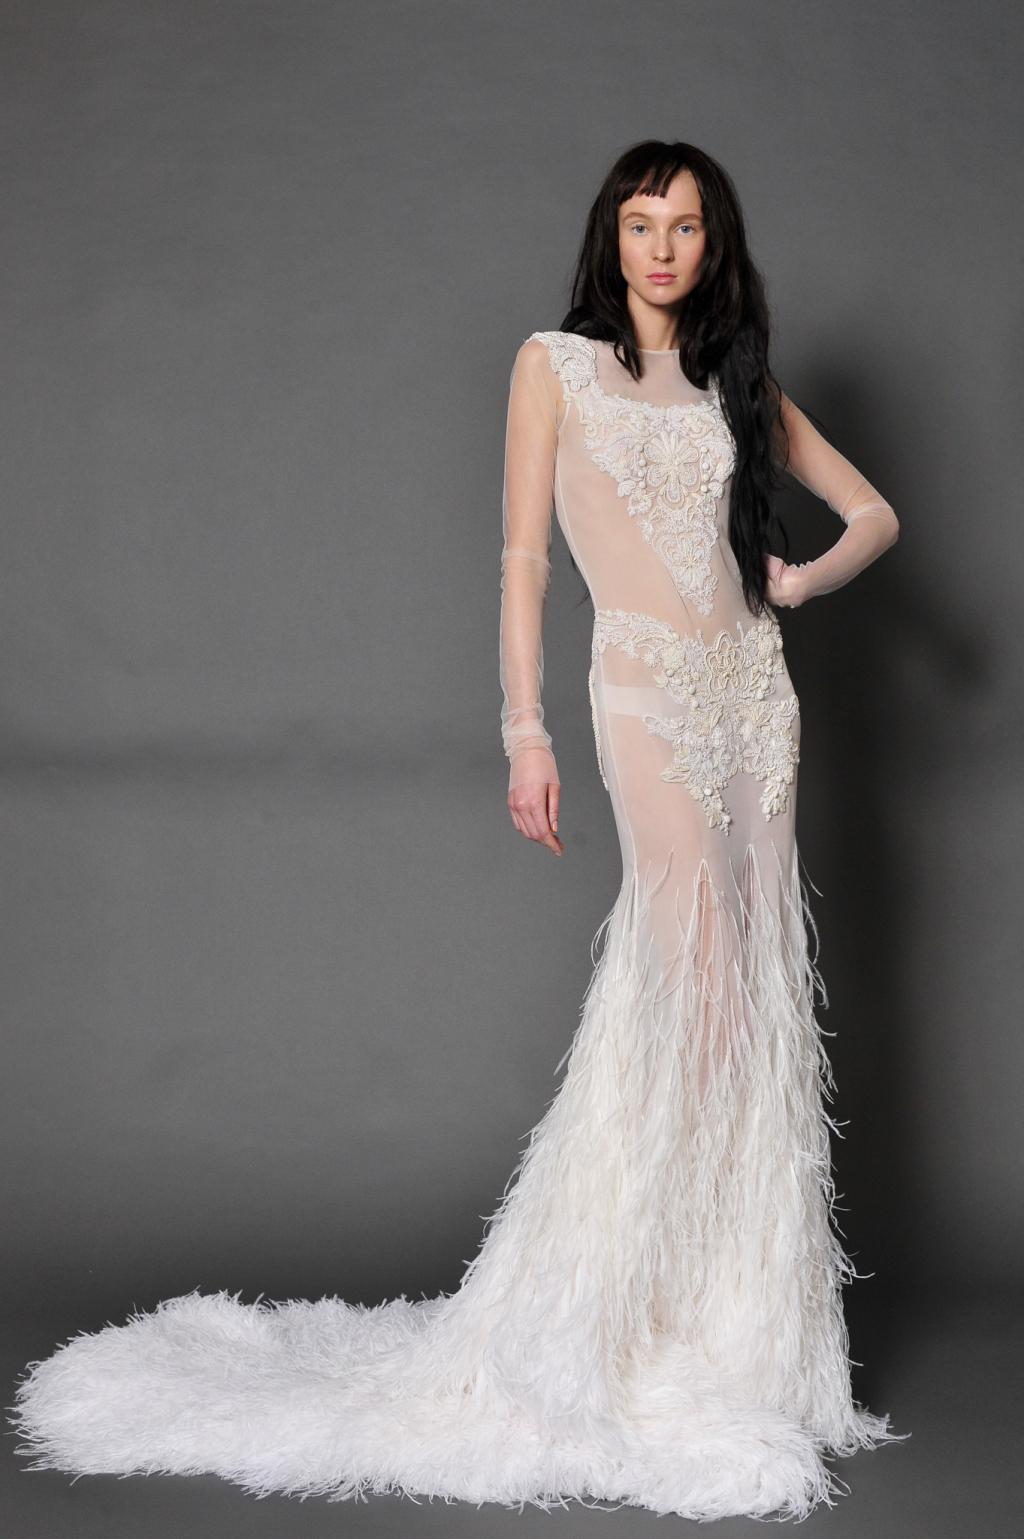 Vera Wang's Fall 2016 Wedding Dress Collection